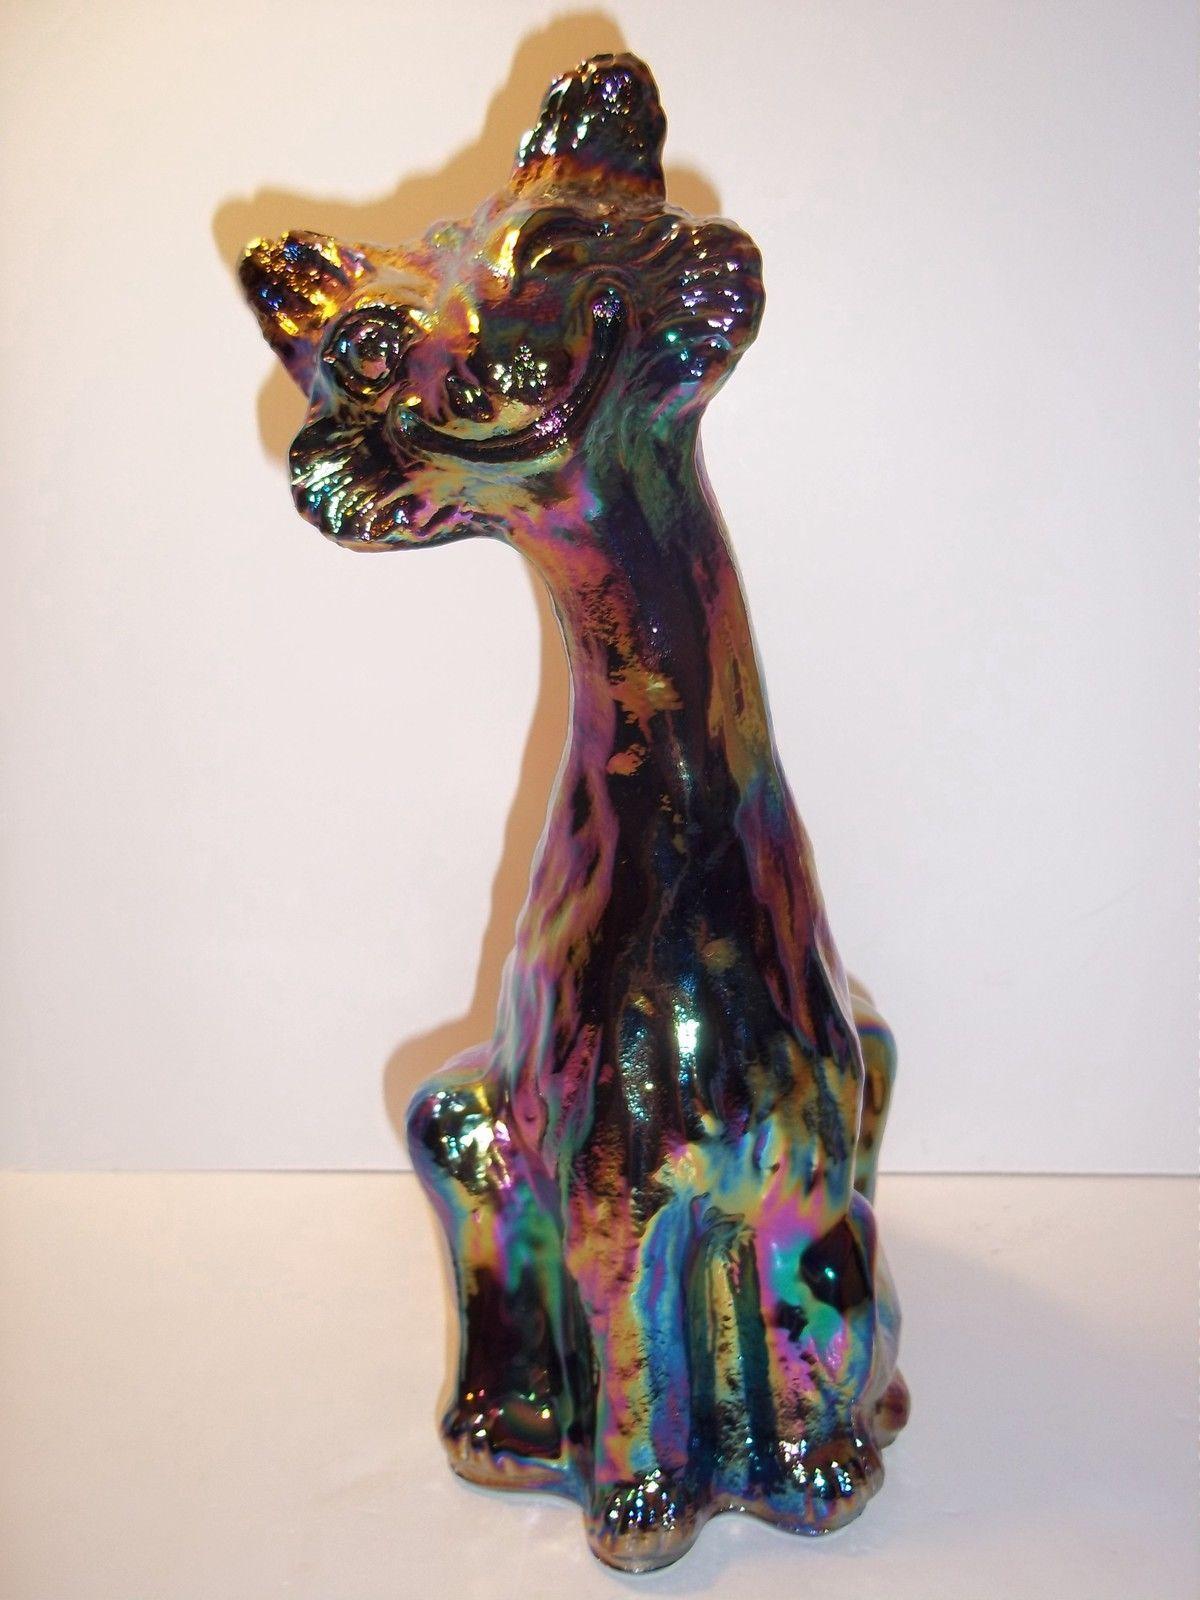 Fenton glass black carnival iridized alley cat figurine